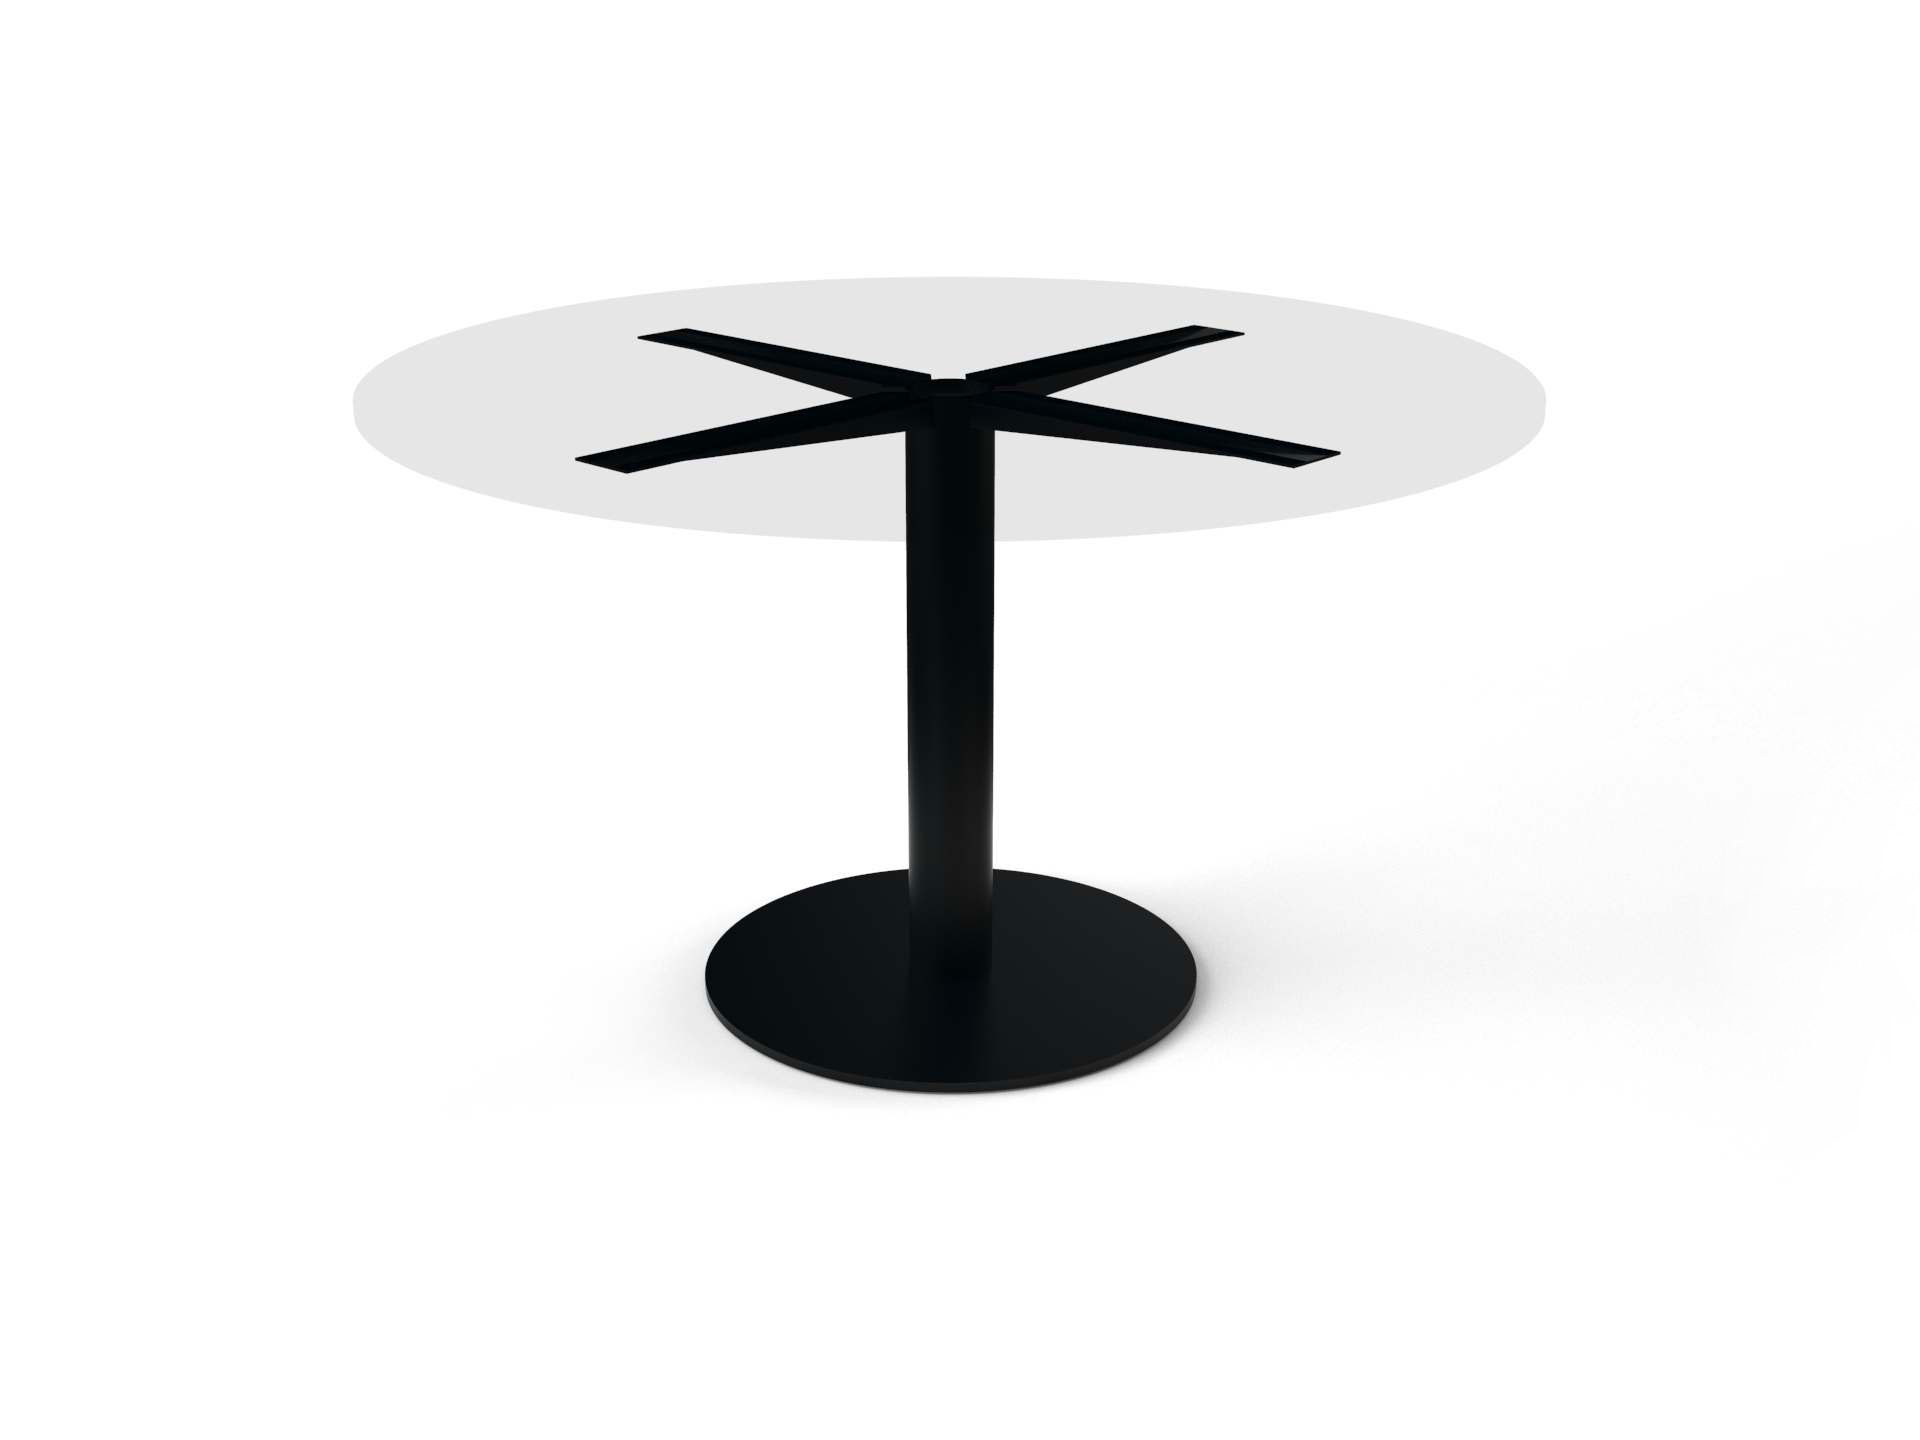 Tischgestell Lucca